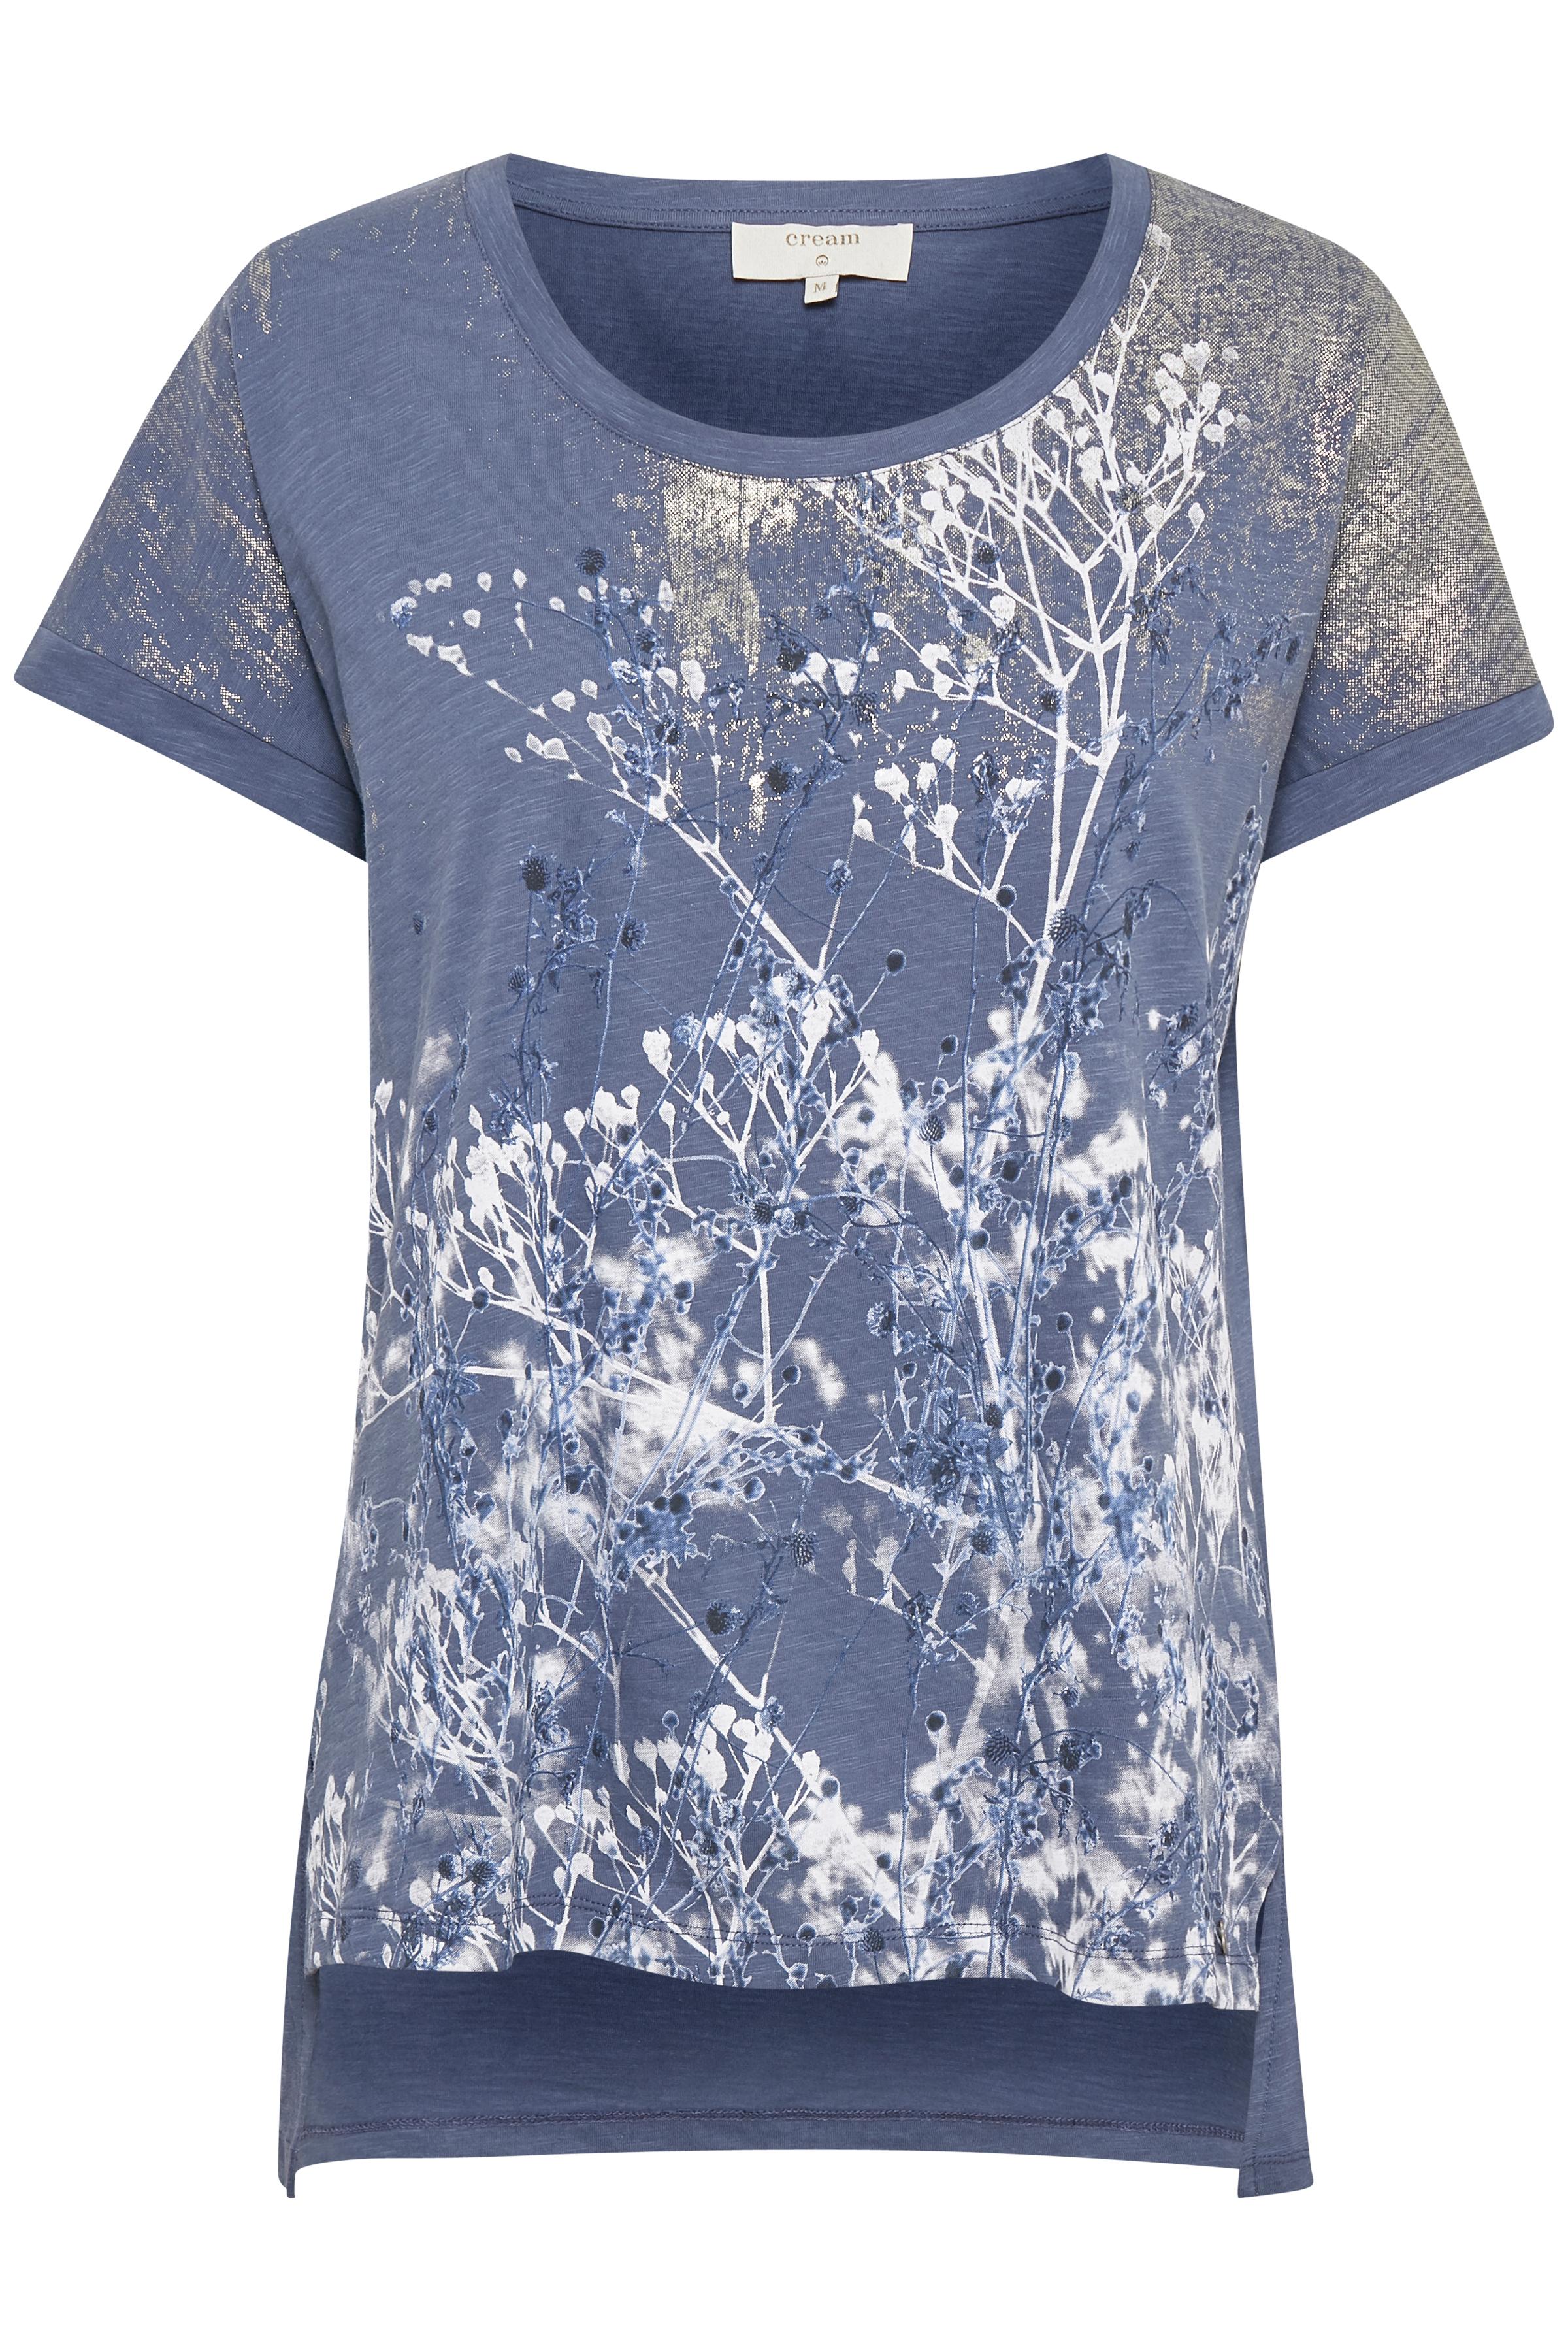 Image of Cream Dame T-shirt - Blå/hvid